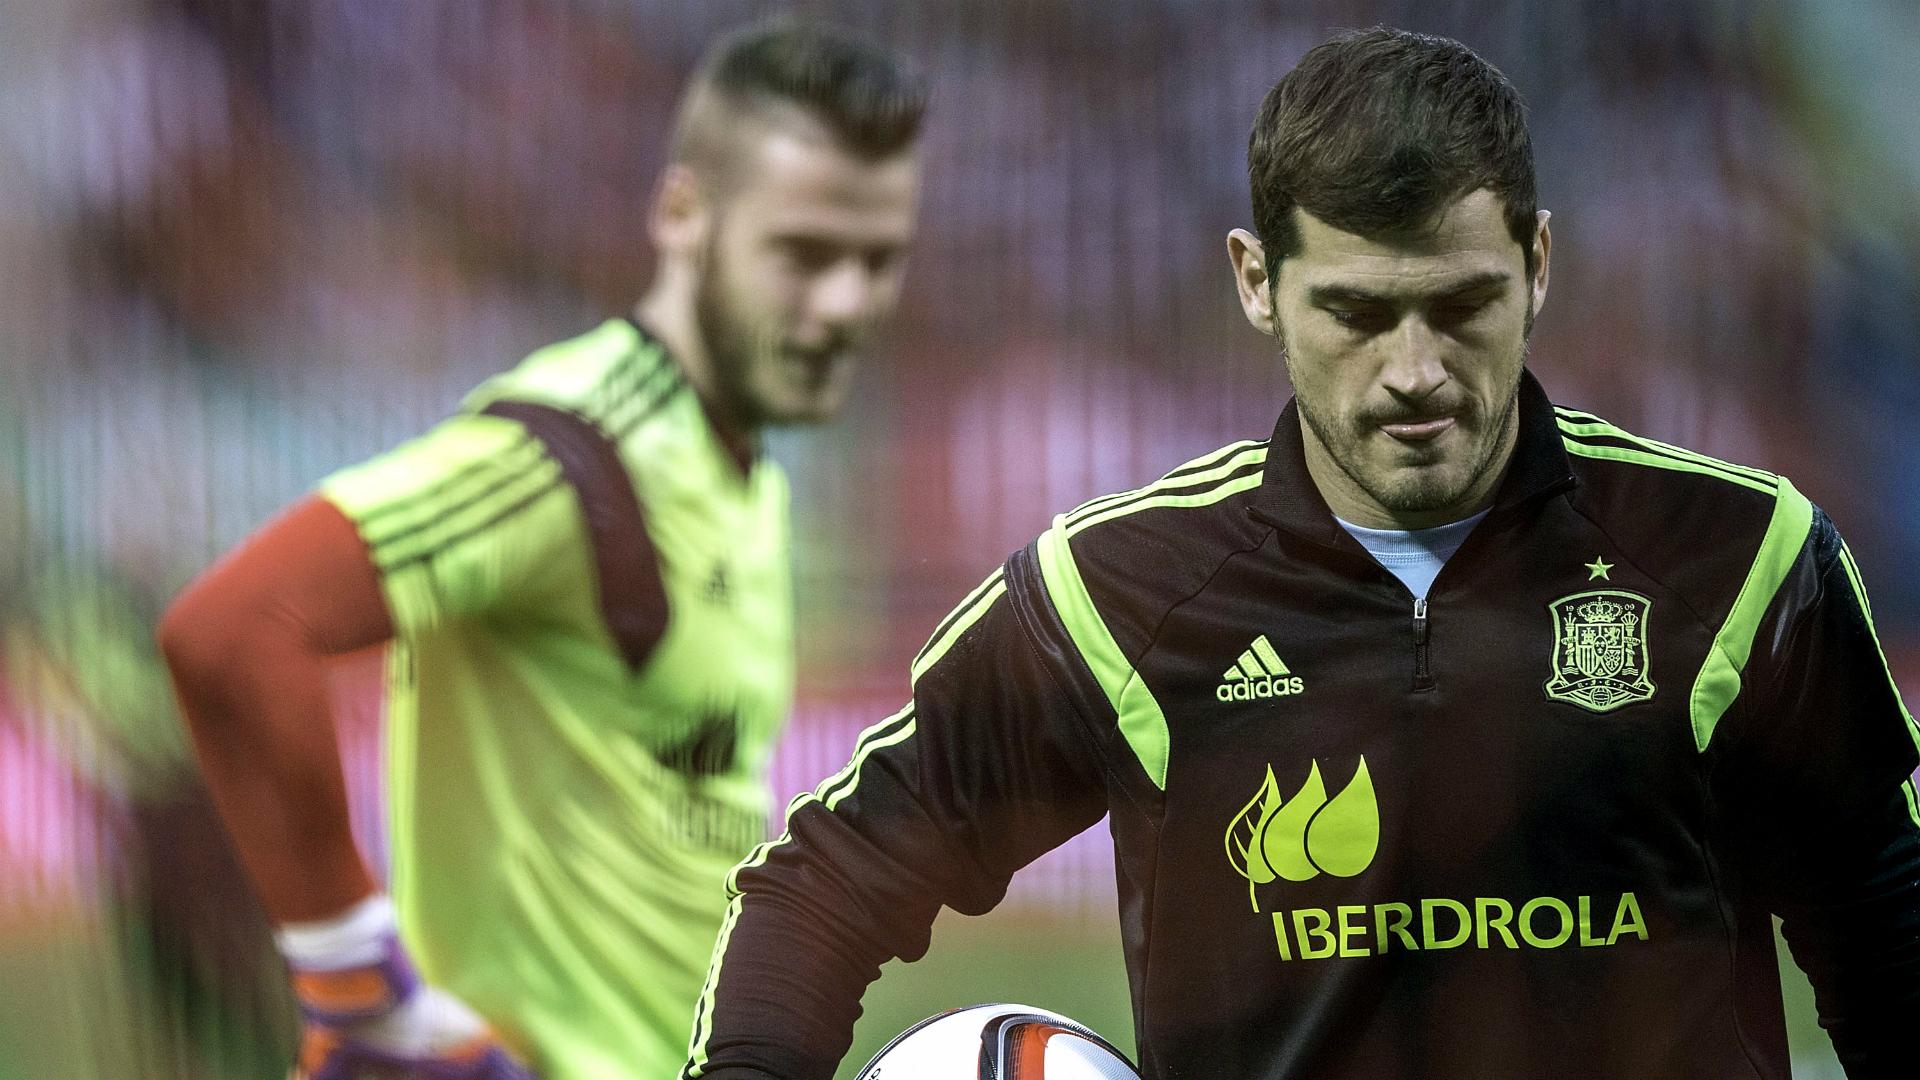 Iker Casillas David De Gea Spain Goalcom